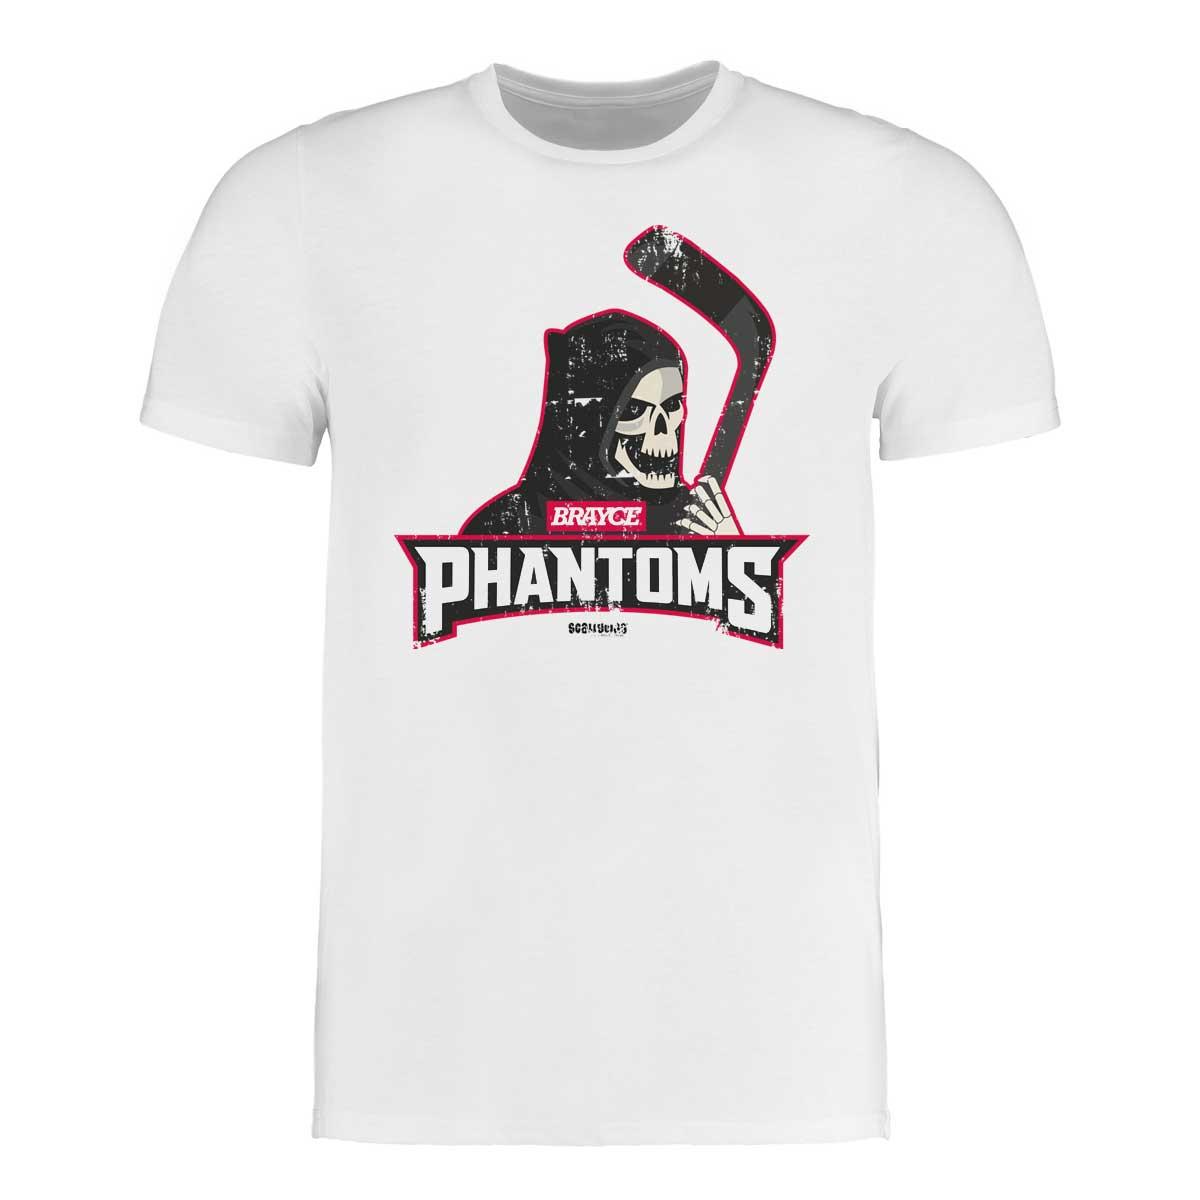 SCALLYWAG® Eishockey T-Shirt Deadly Phantoms